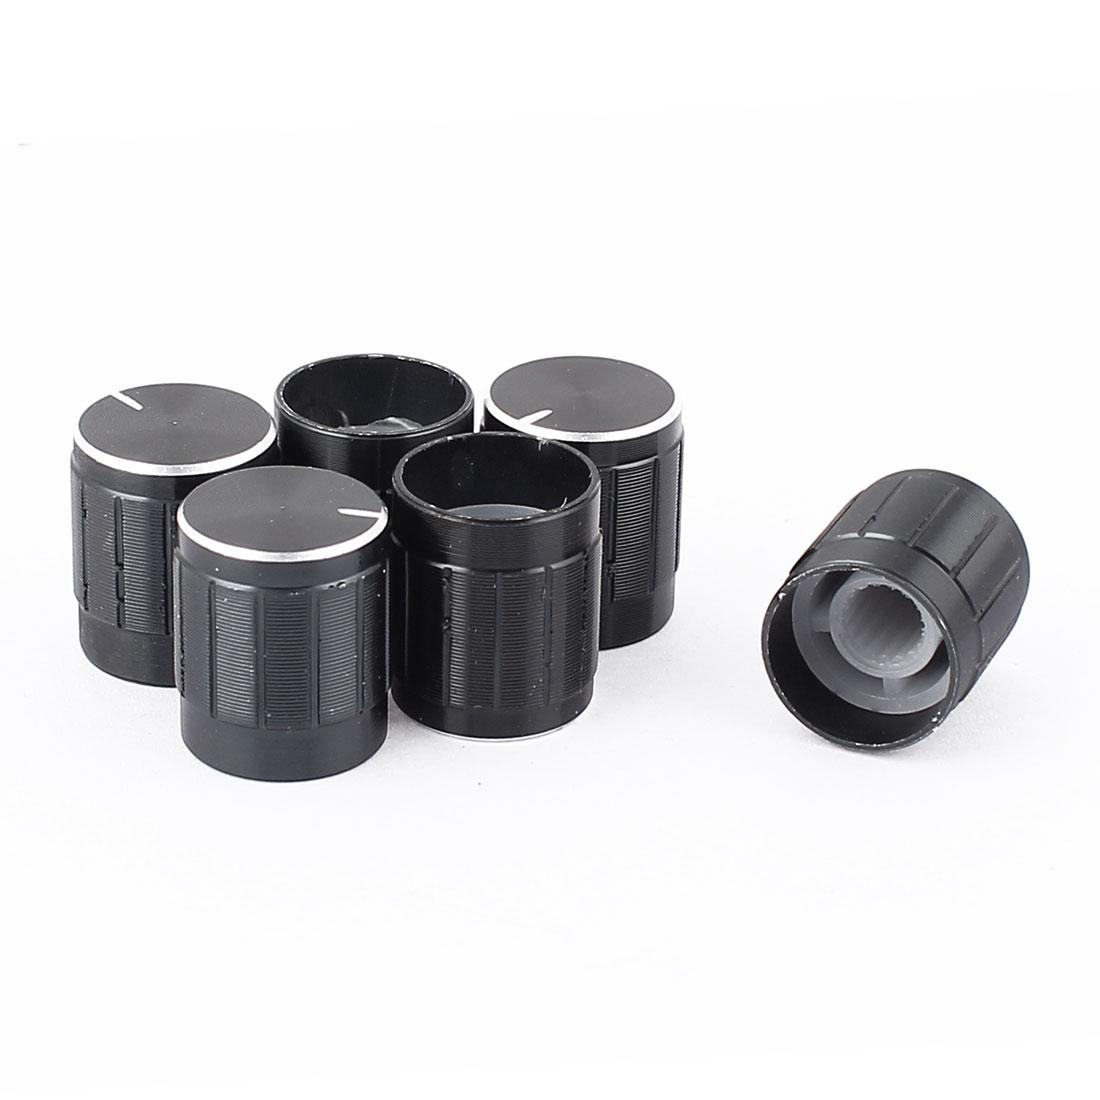 5mm Dia Shaft 17mm x 15mm Metal Round Potentiometer Rotary Knob Cap Black 6Pcs